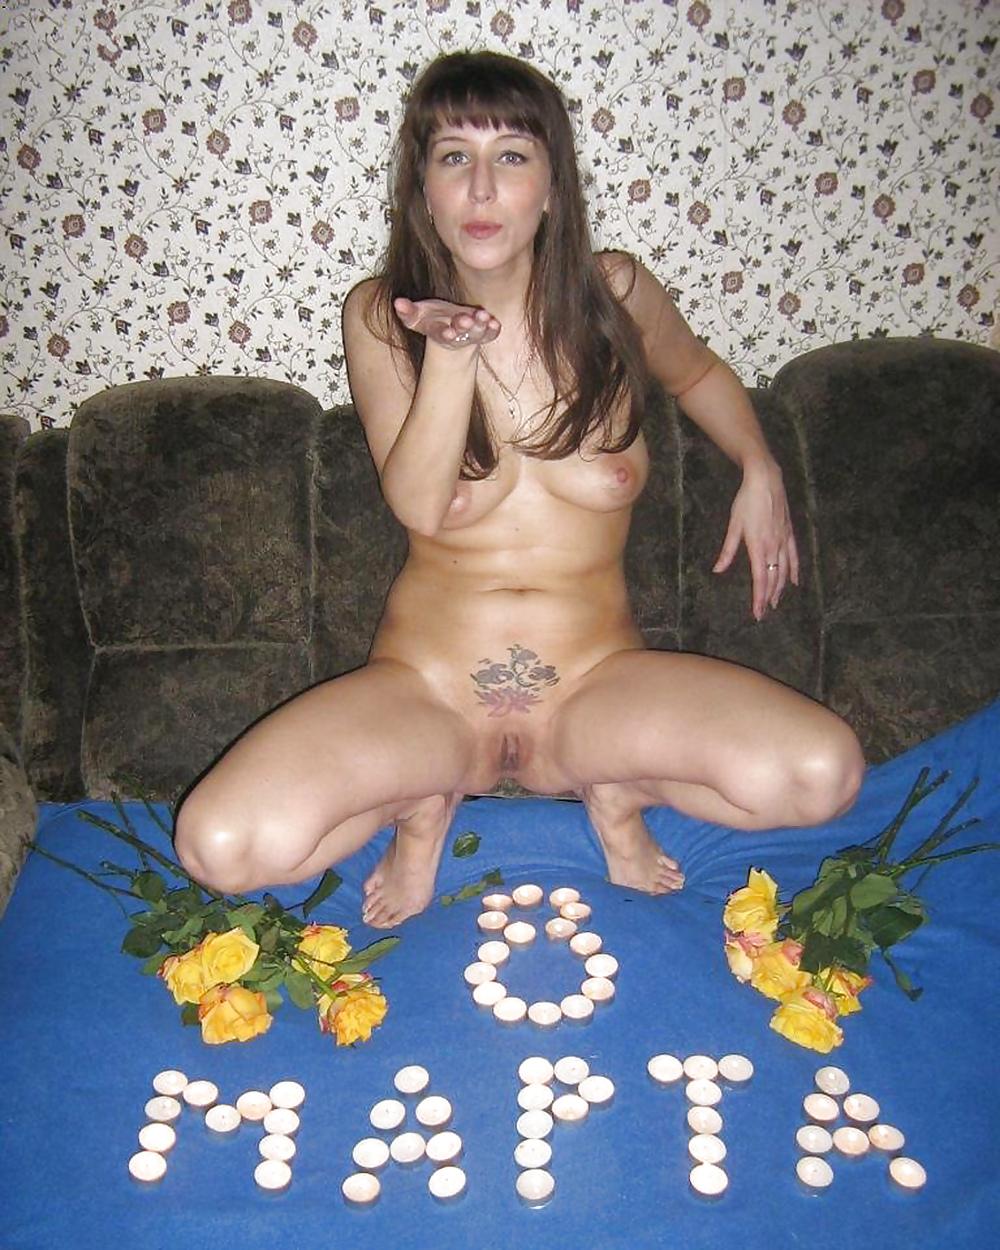 porno-russkoe-shmari-smotret-erotiku-onlayn-s-russkim-perevodom